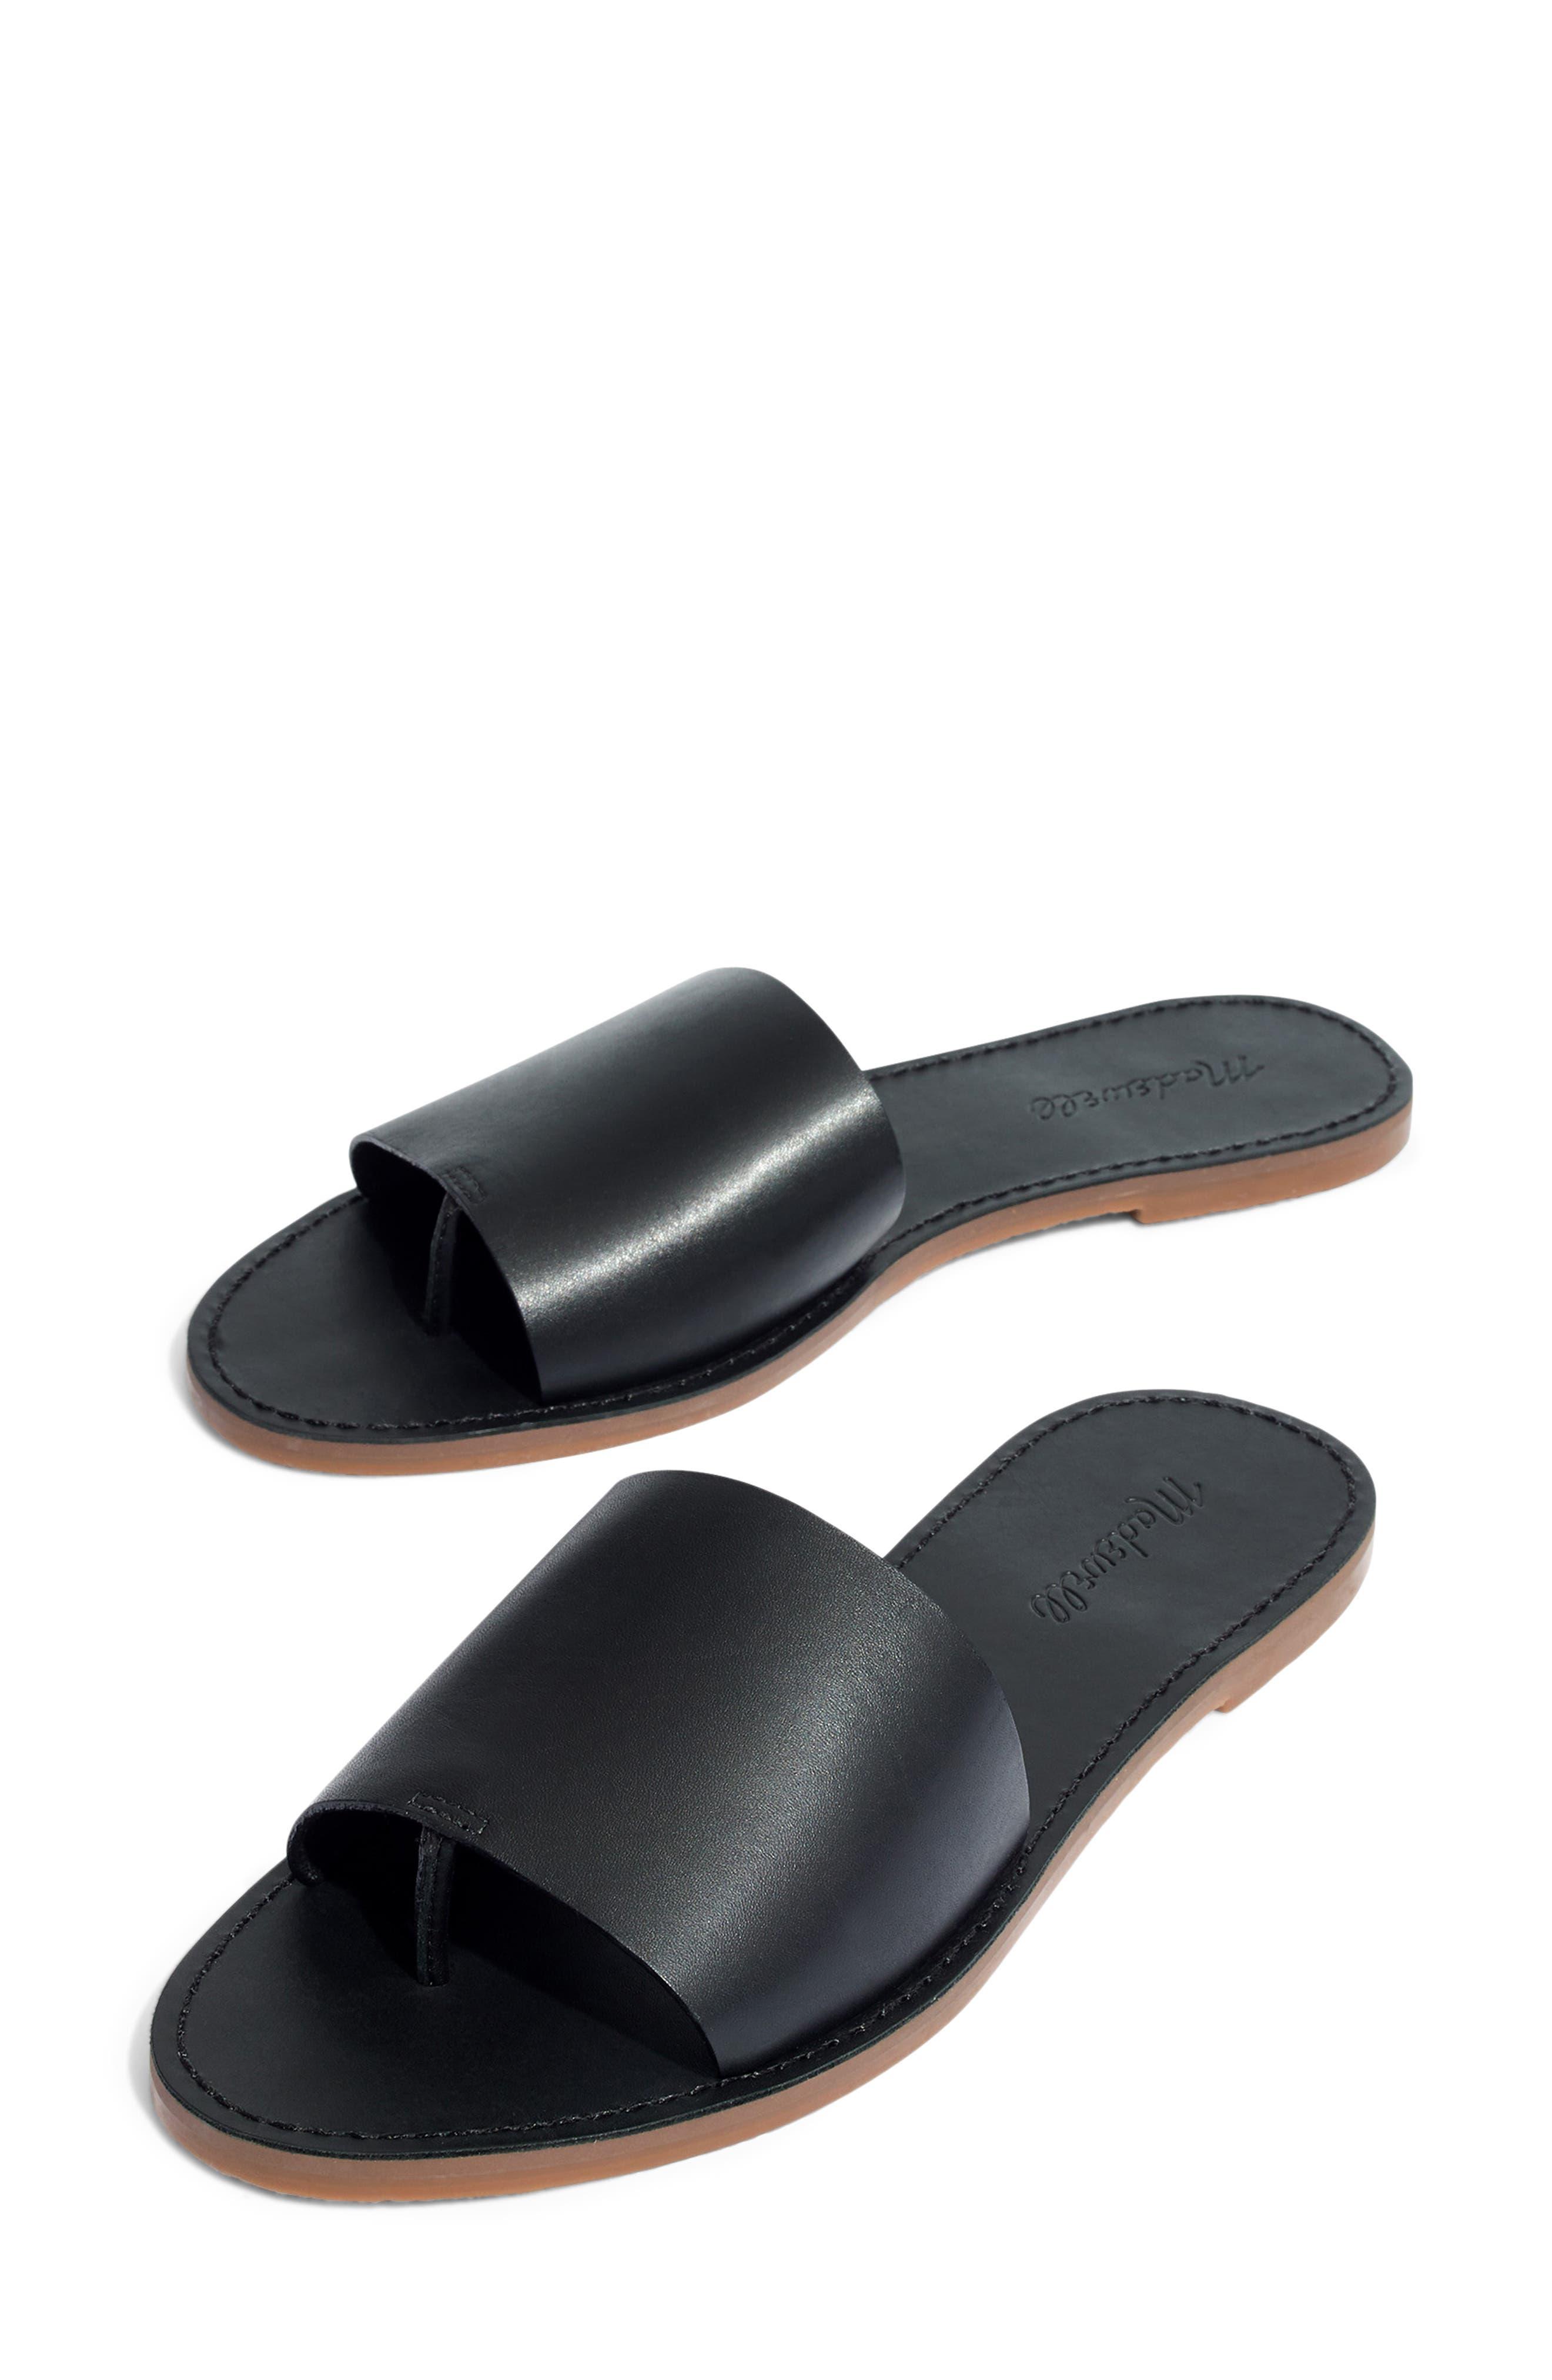 MADEWELL, Boardwalk Post Slide Sandal, Main thumbnail 1, color, TRUE BLACK LEATHER